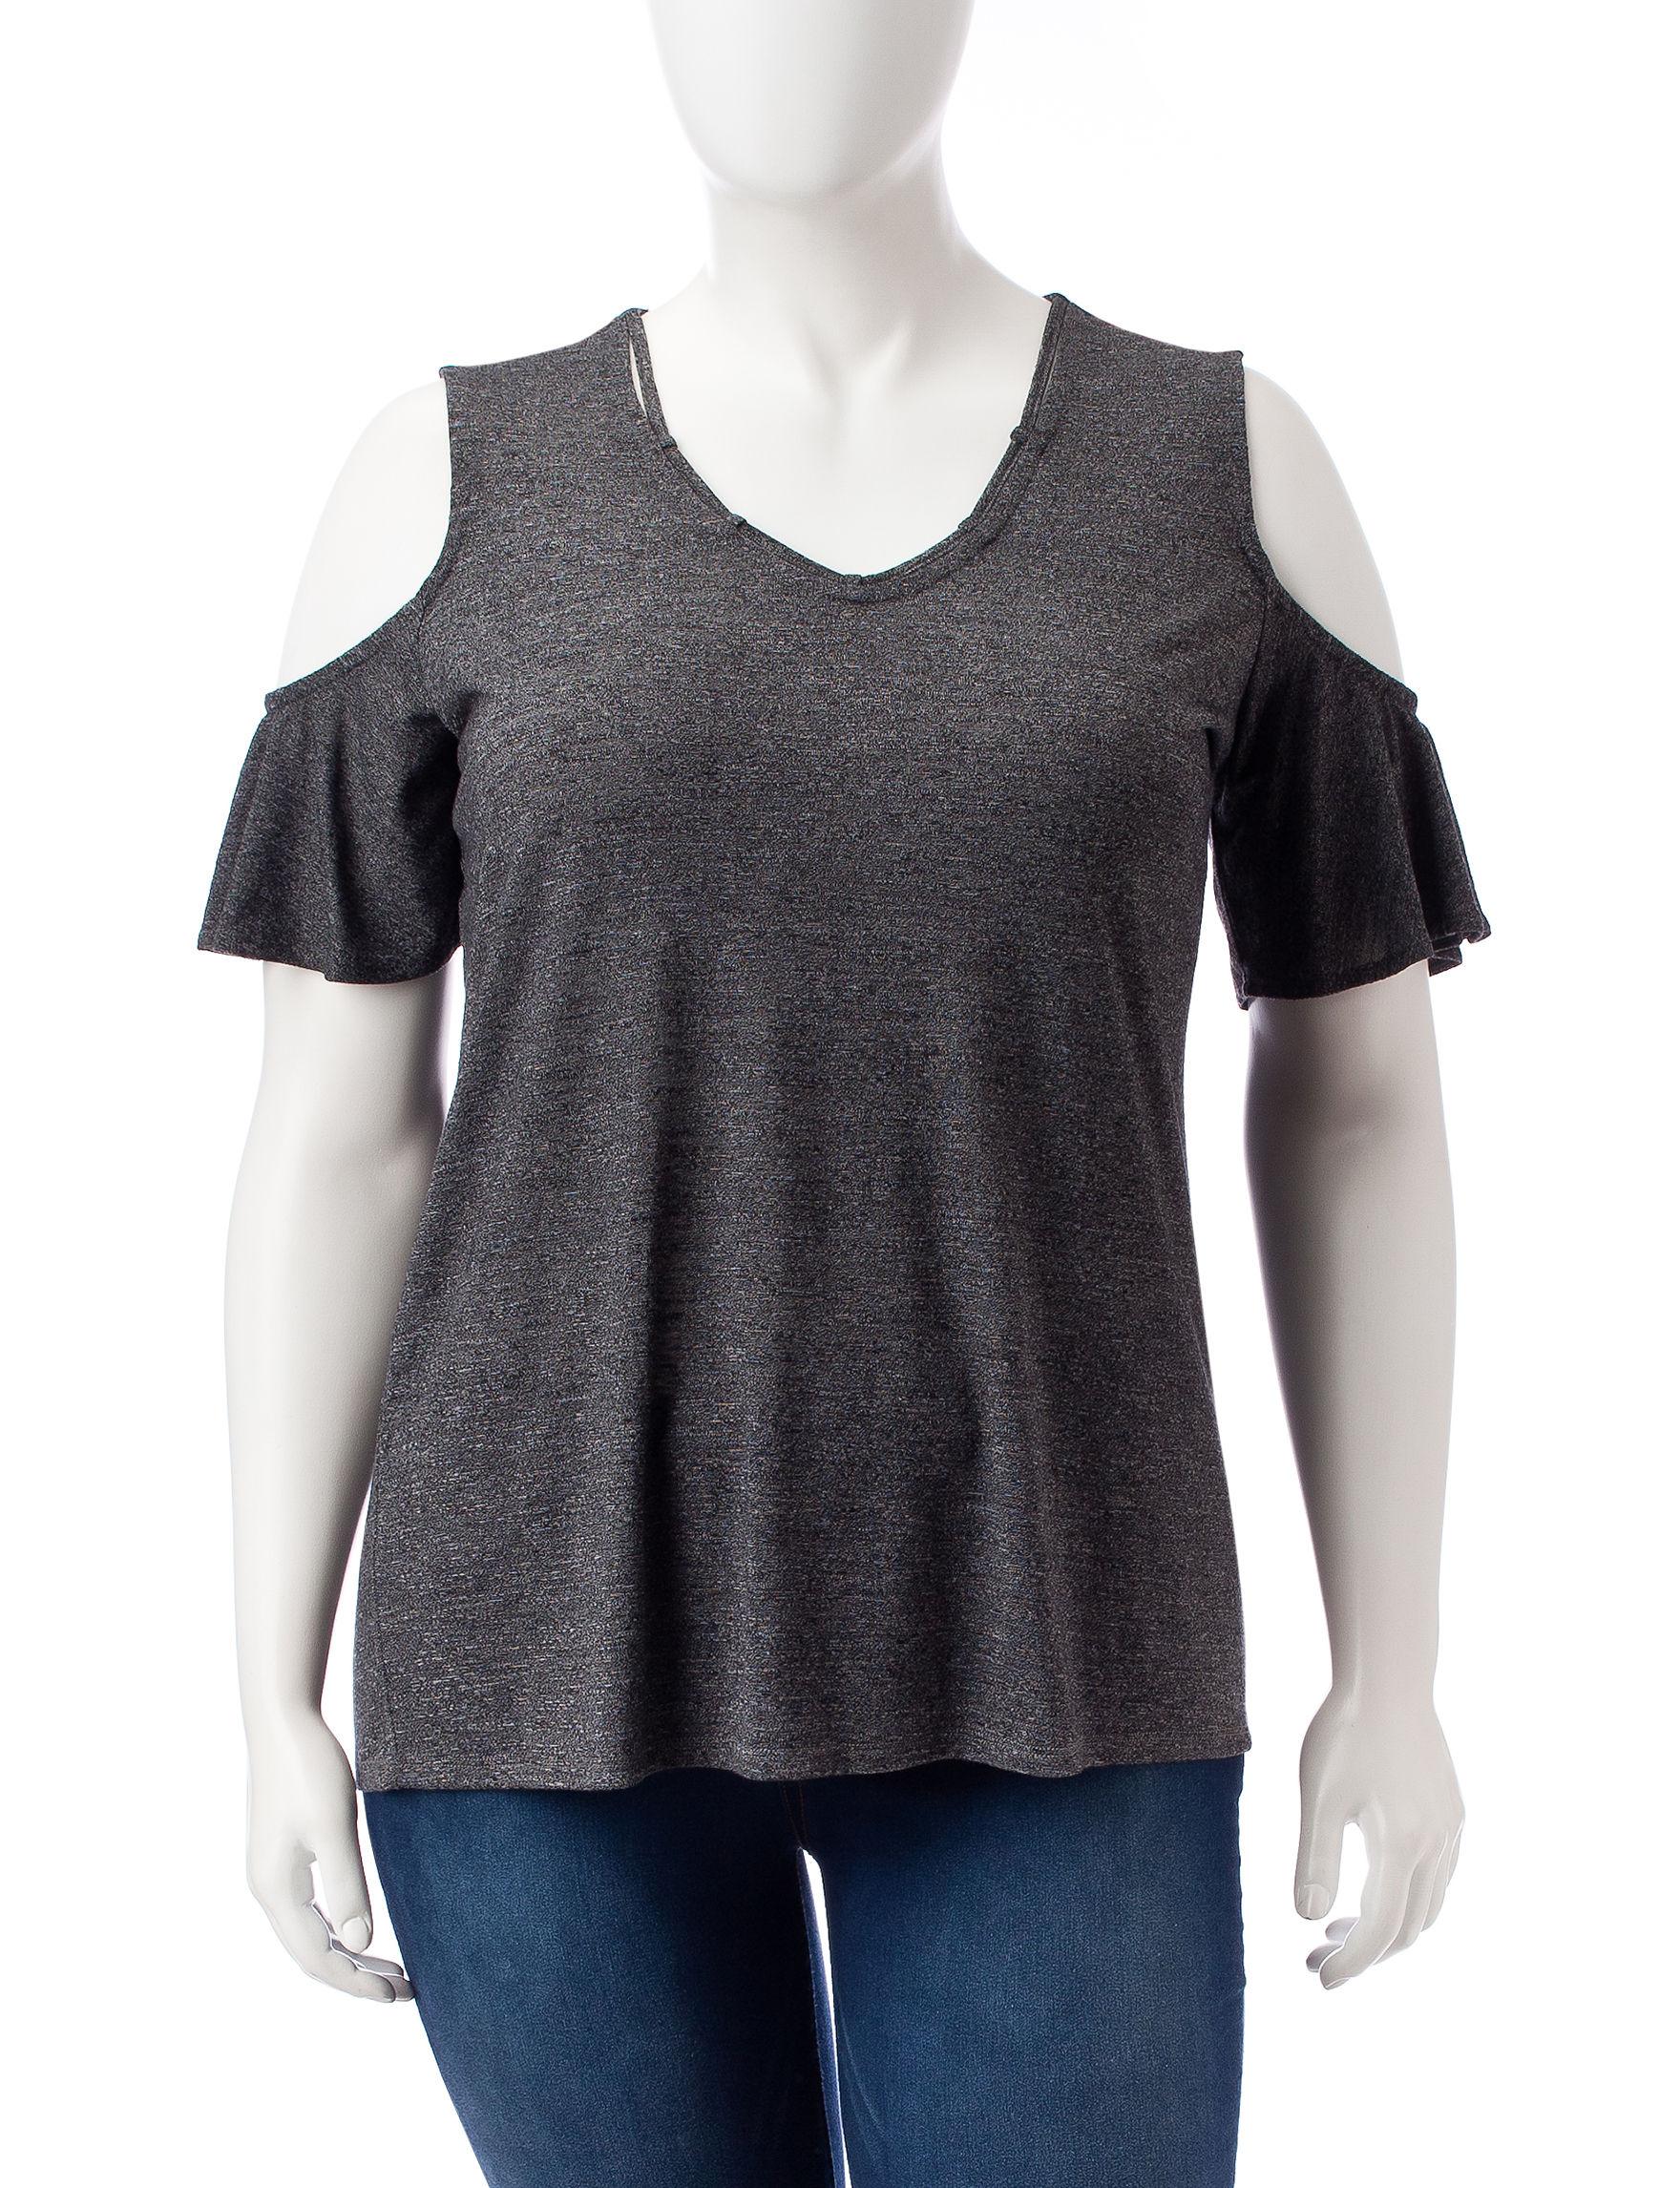 Signature Studio Dark Grey Shirts & Blouses